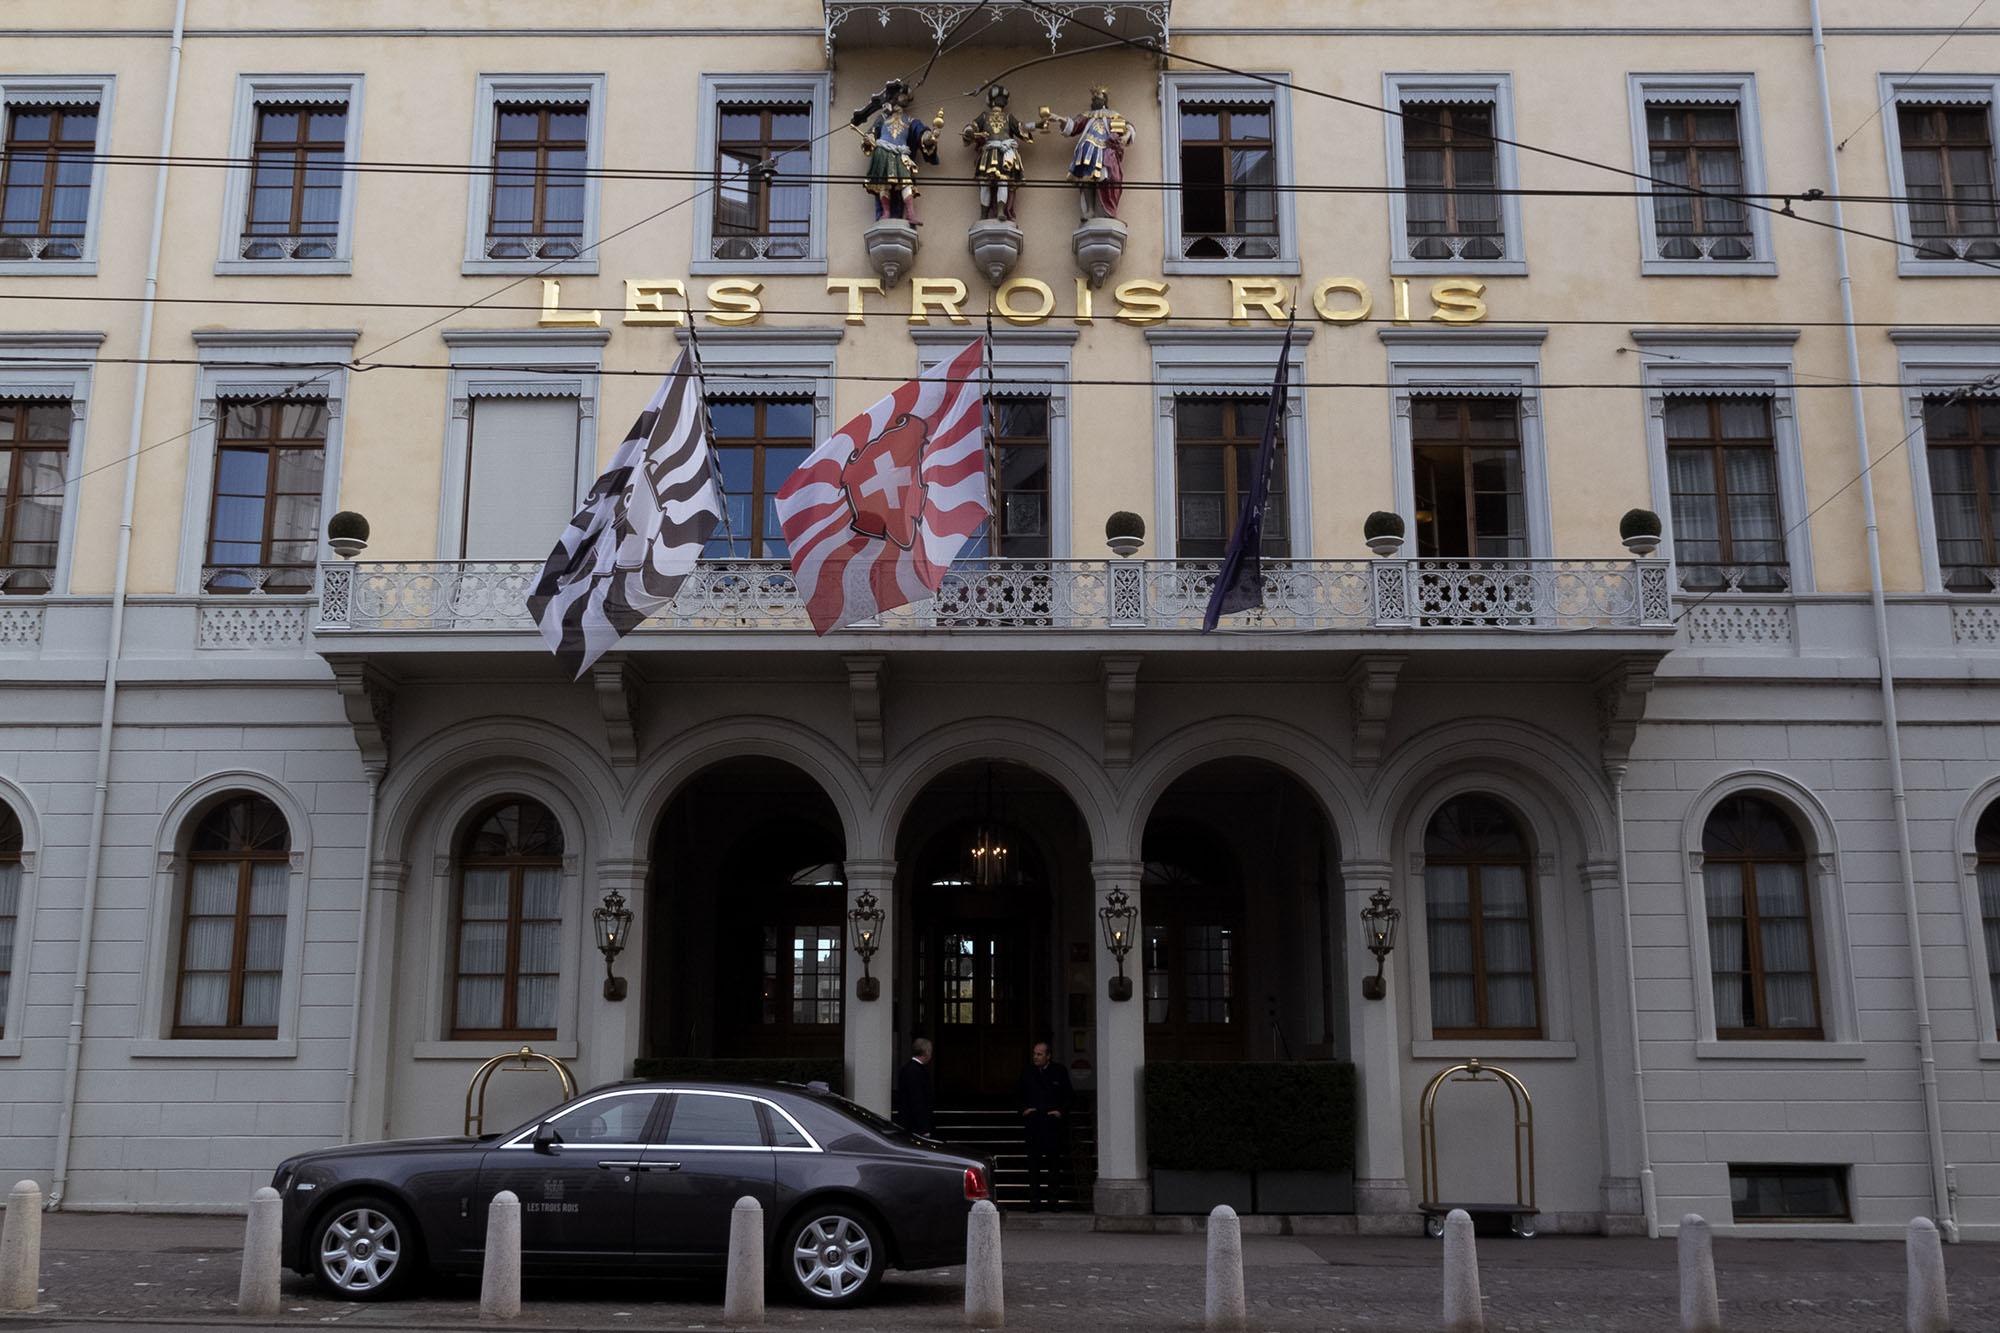 Hochzeitsfotograf Basel Hochzeit Grand Hotel Les Trois Rois Basel